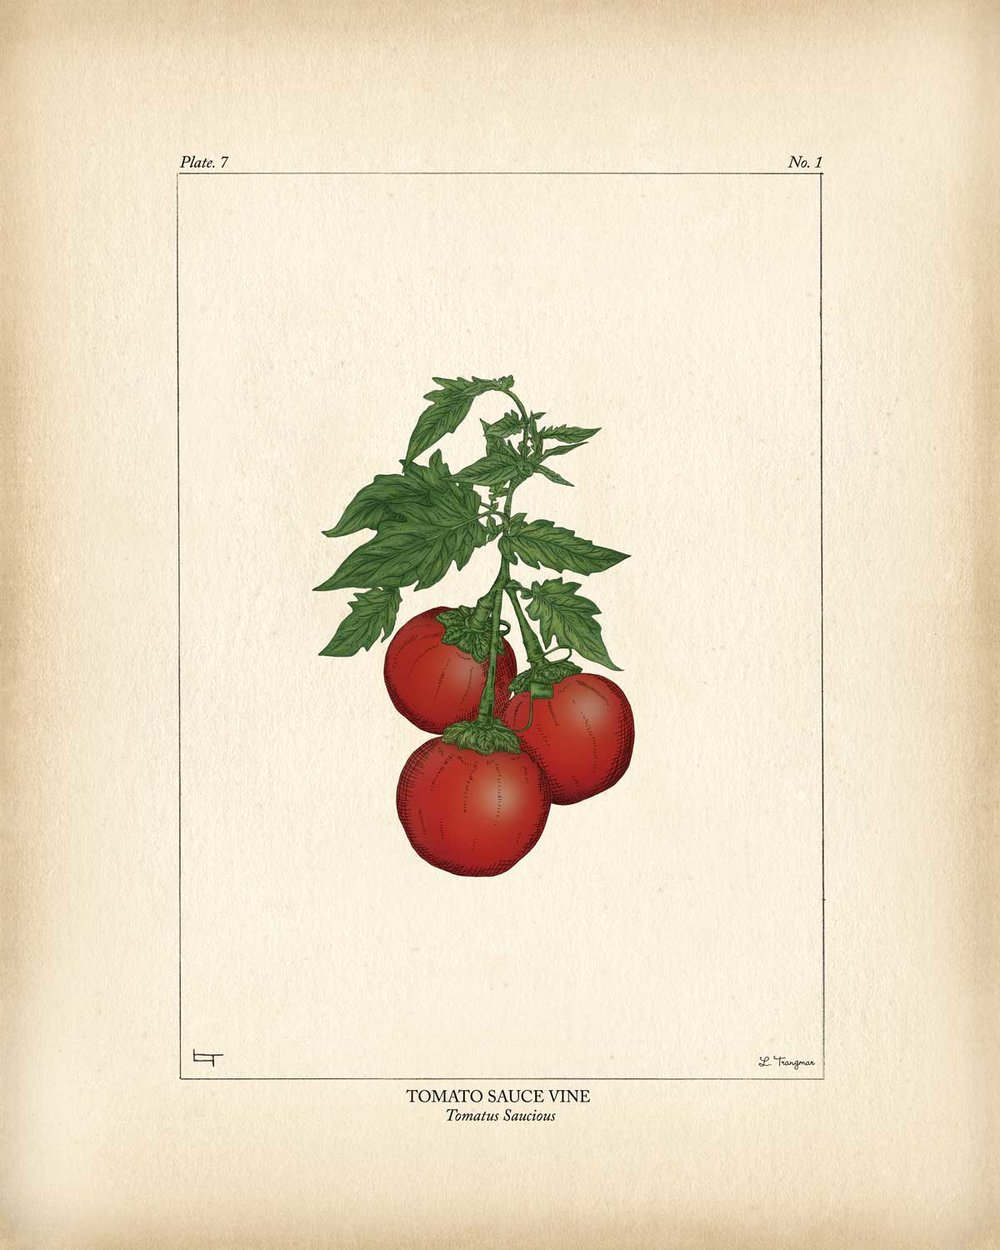 Tomato Sauce Vine